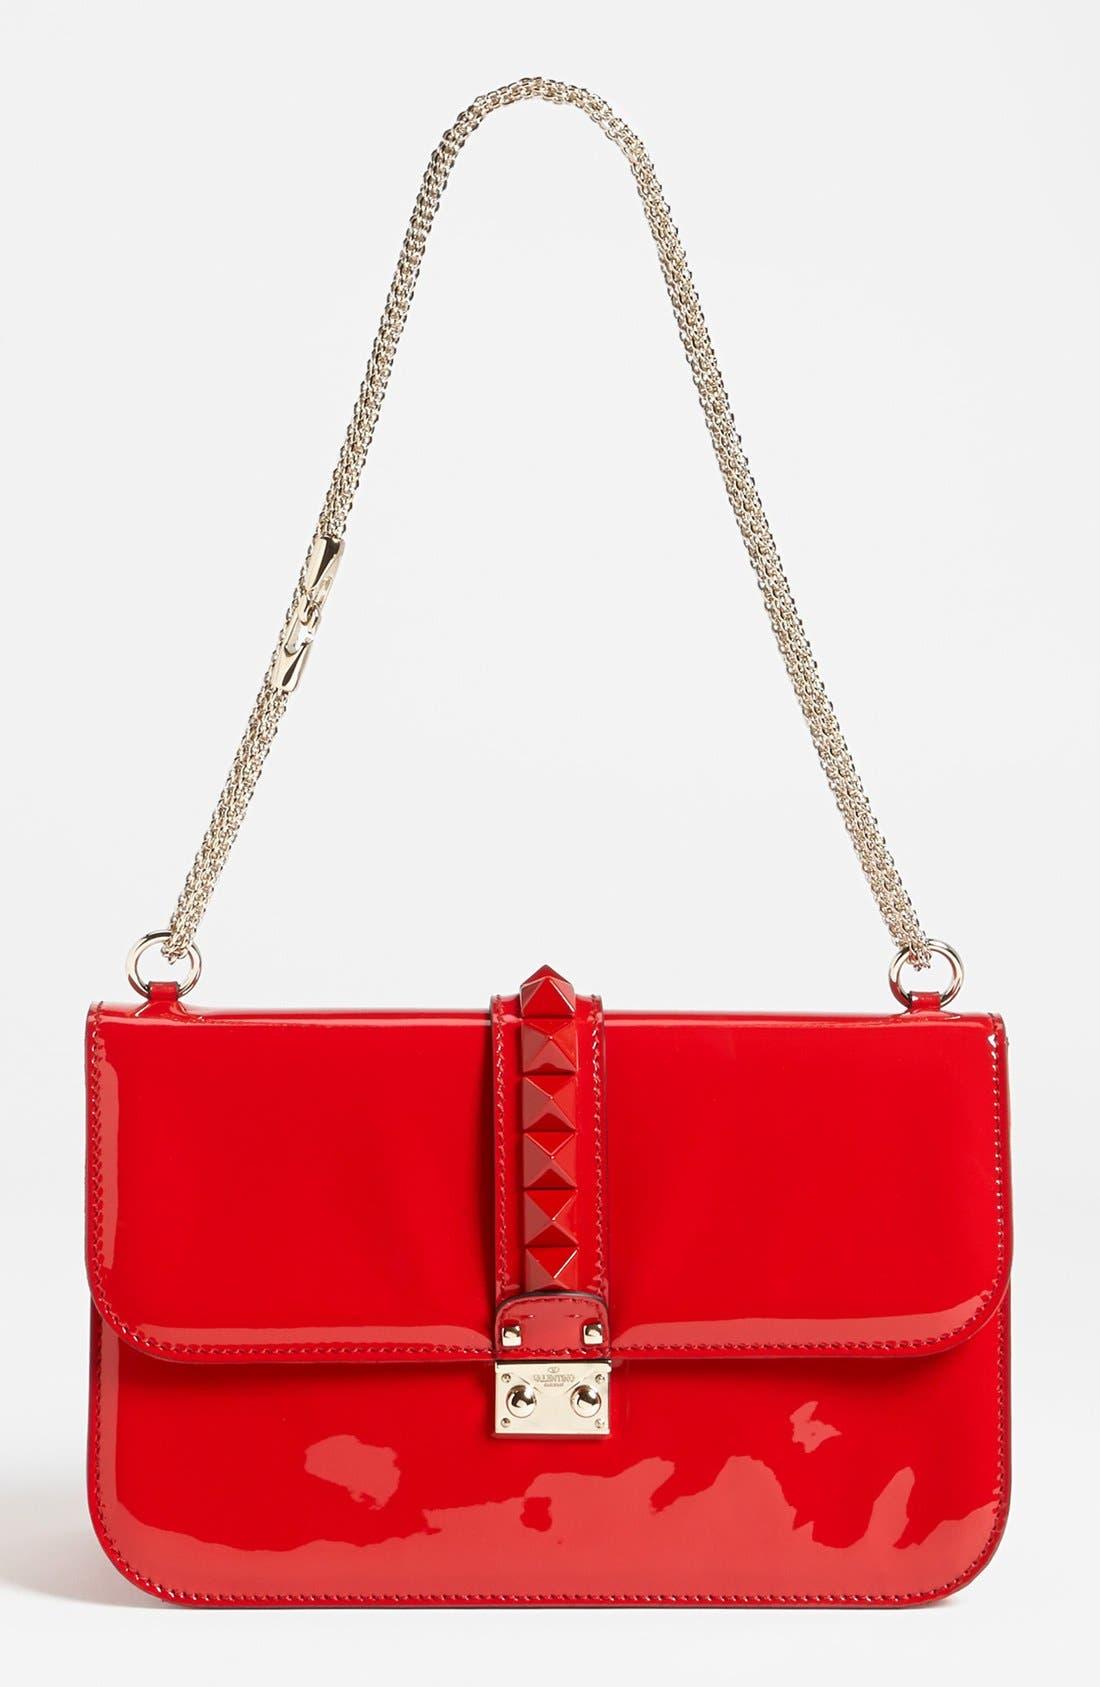 Main Image - Valentino 'Punkouture - Lock' Leather Shoulder Bag